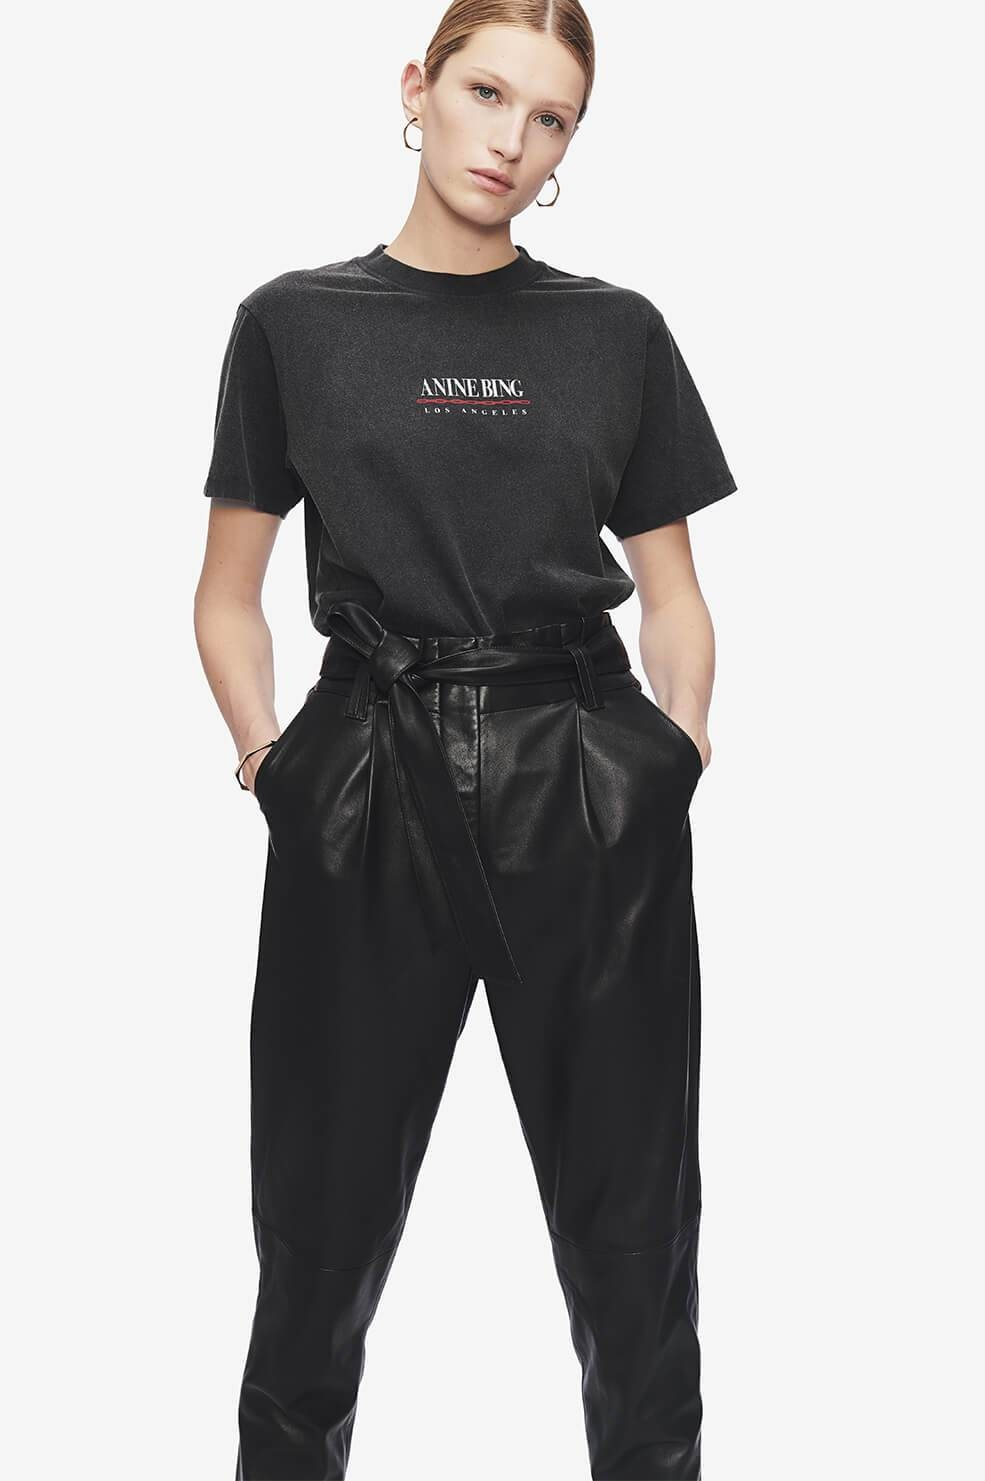 ANINE BING t-shirt lili link-2